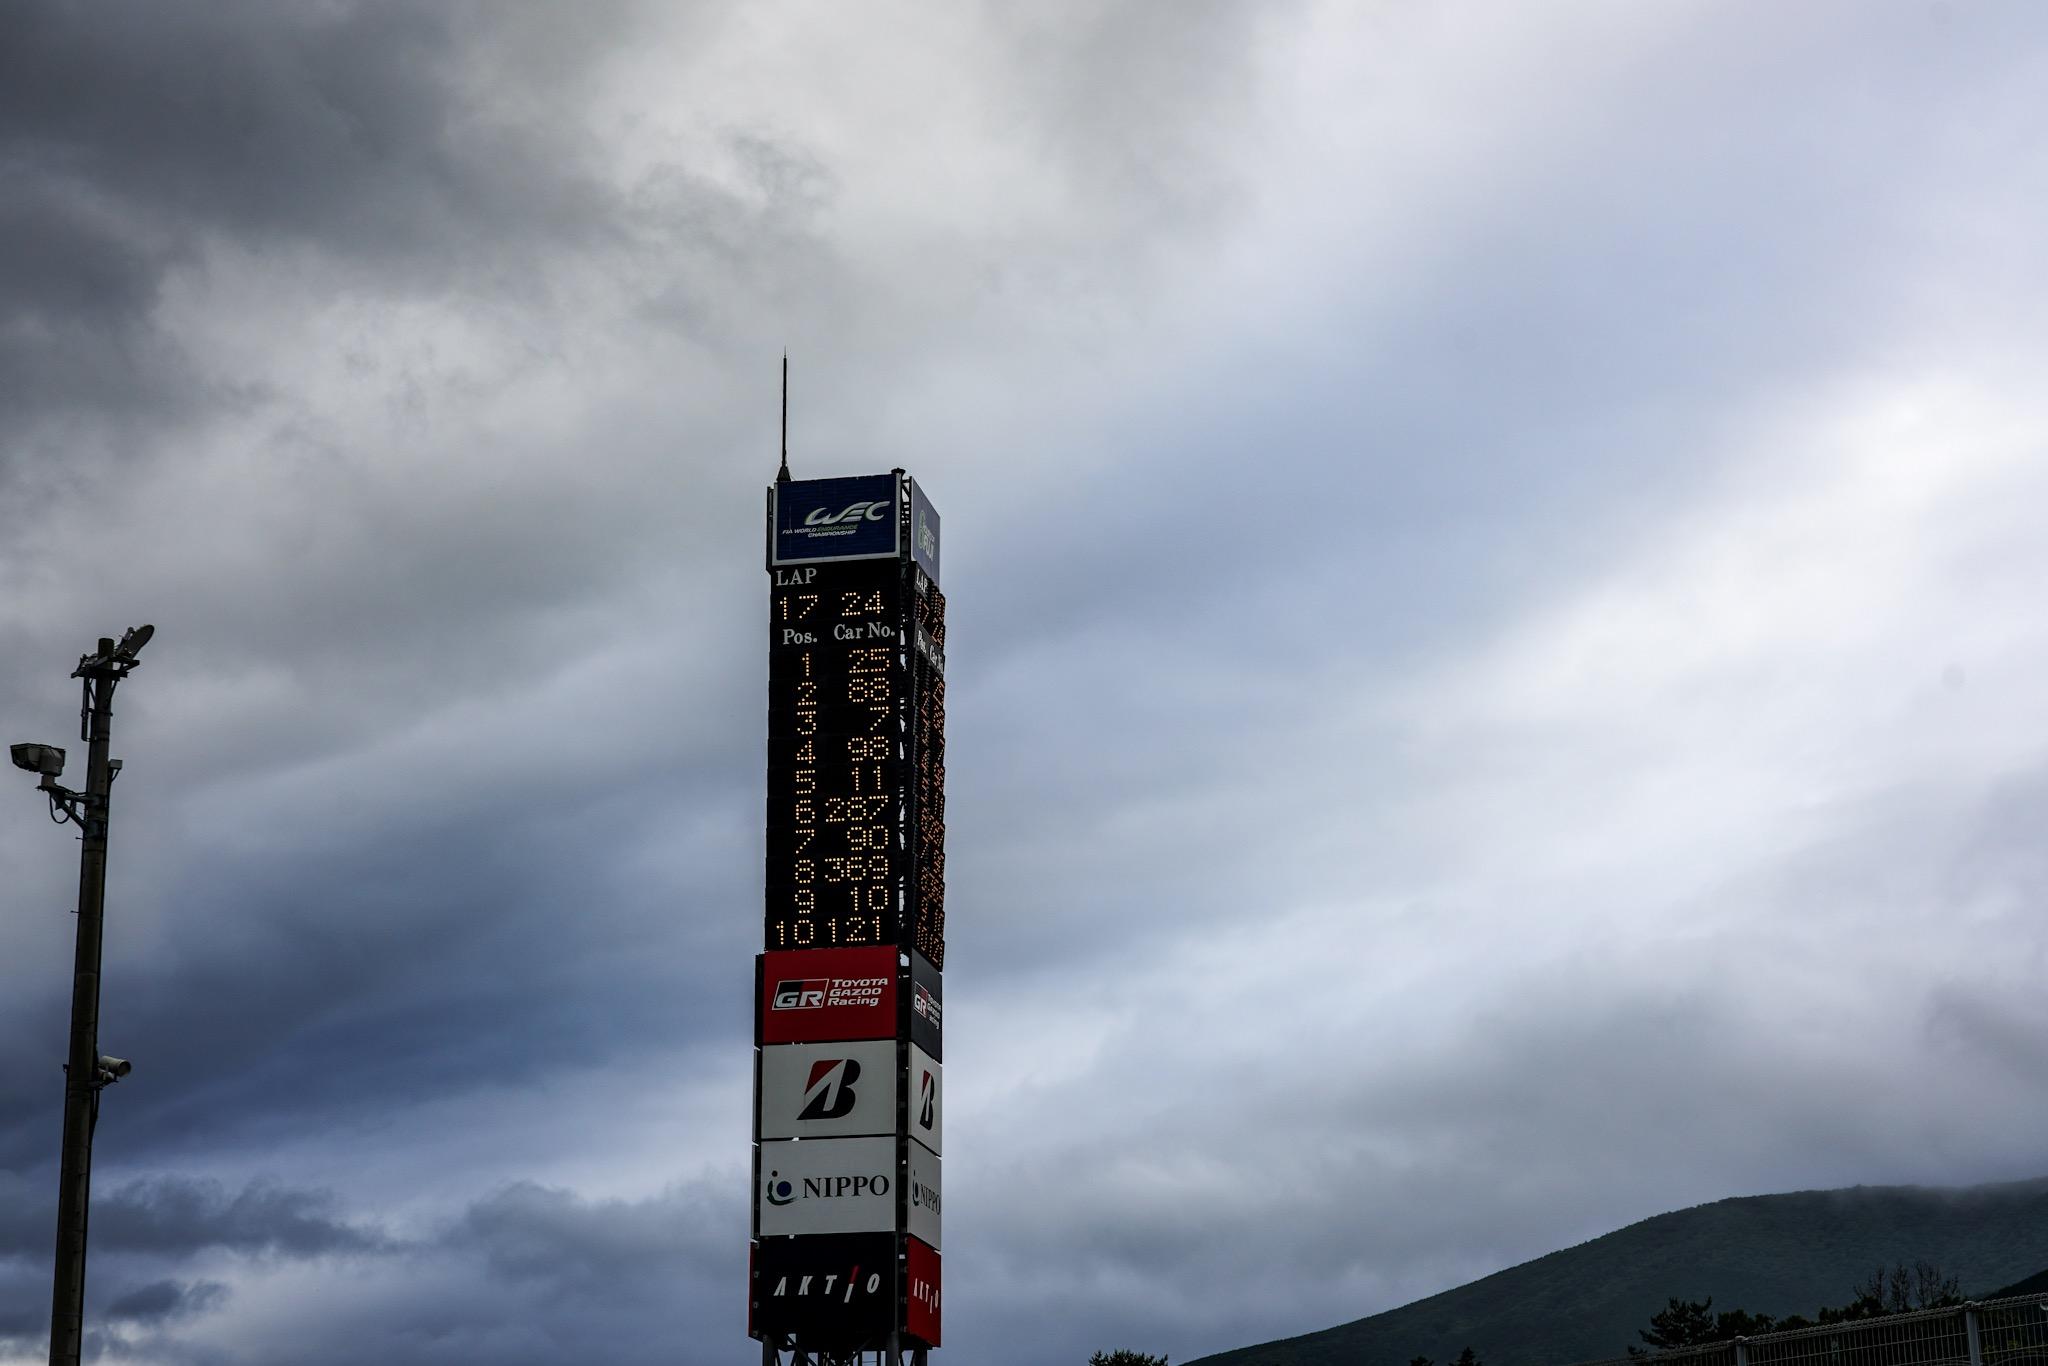 86/BRZレース・プロフェッショナルシリーズ第5戦 長山大介選手優勝